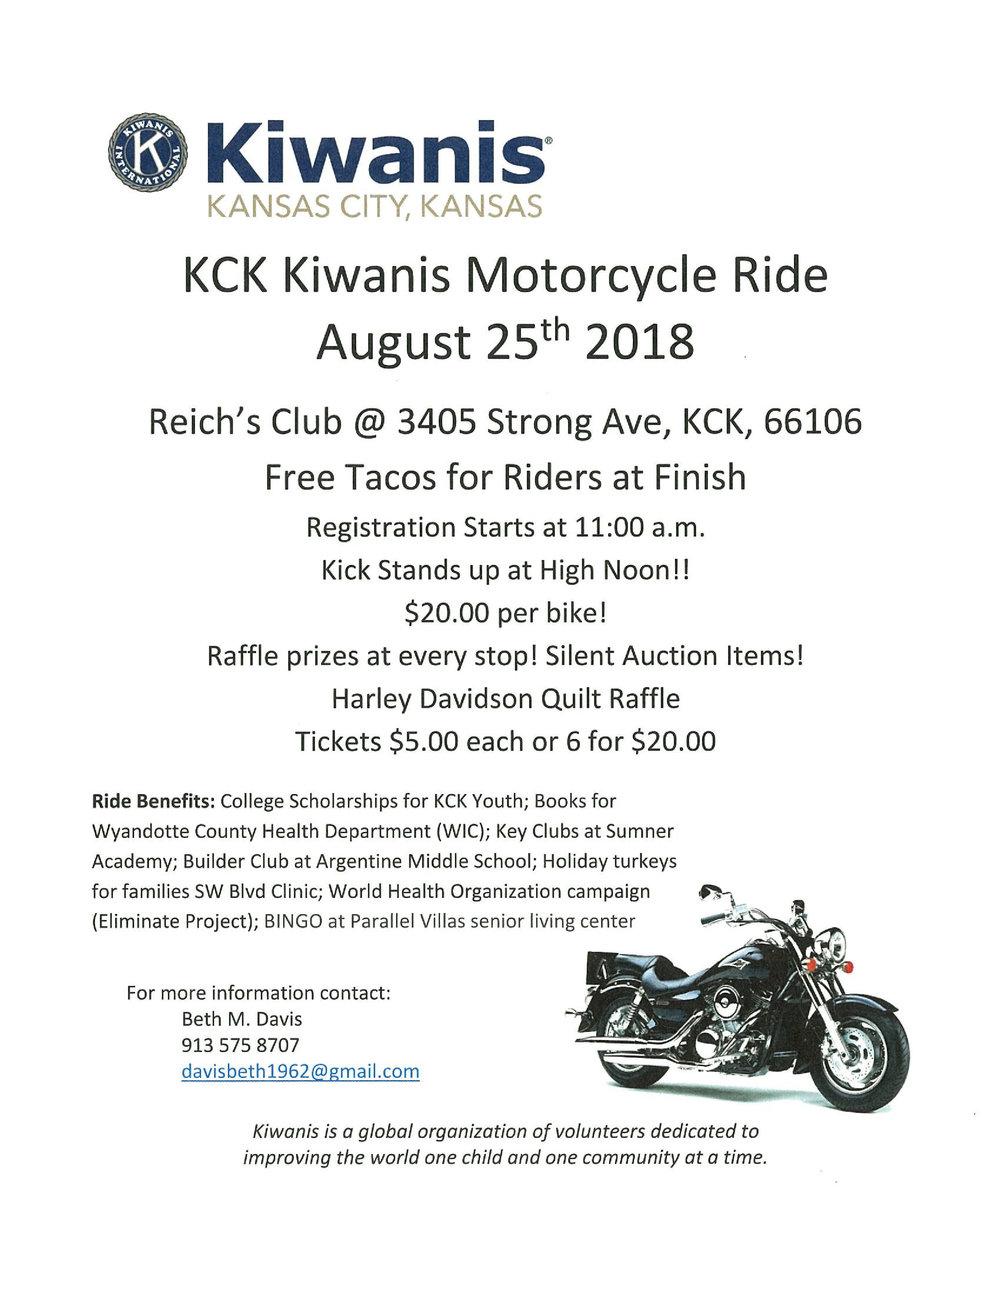 KC Kiwanis Motorcycle ride 2018 Flyer.jpg